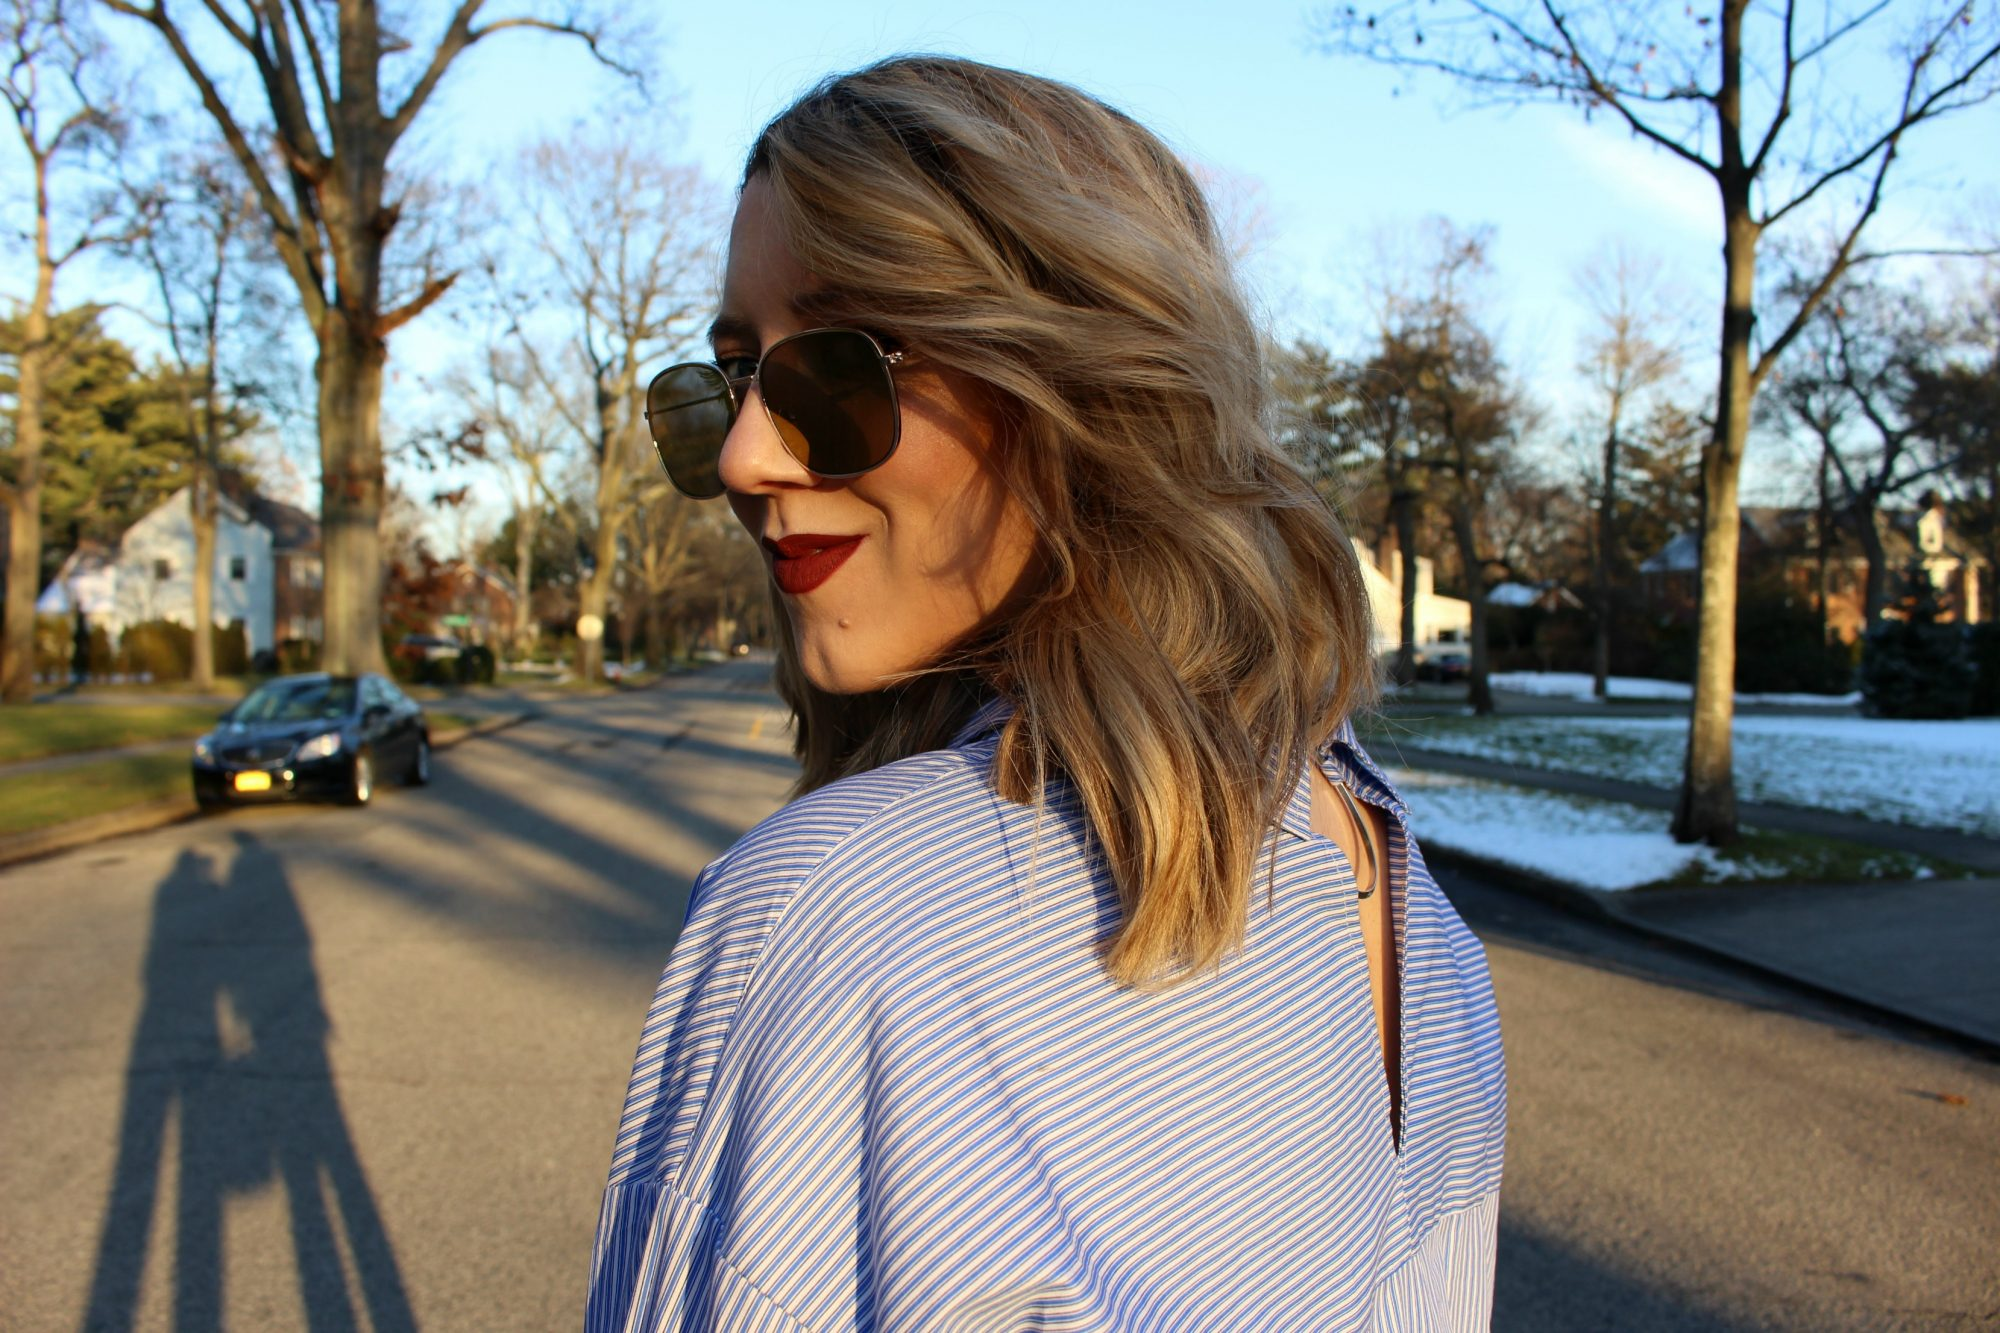 Blue Striped Shirt Trend